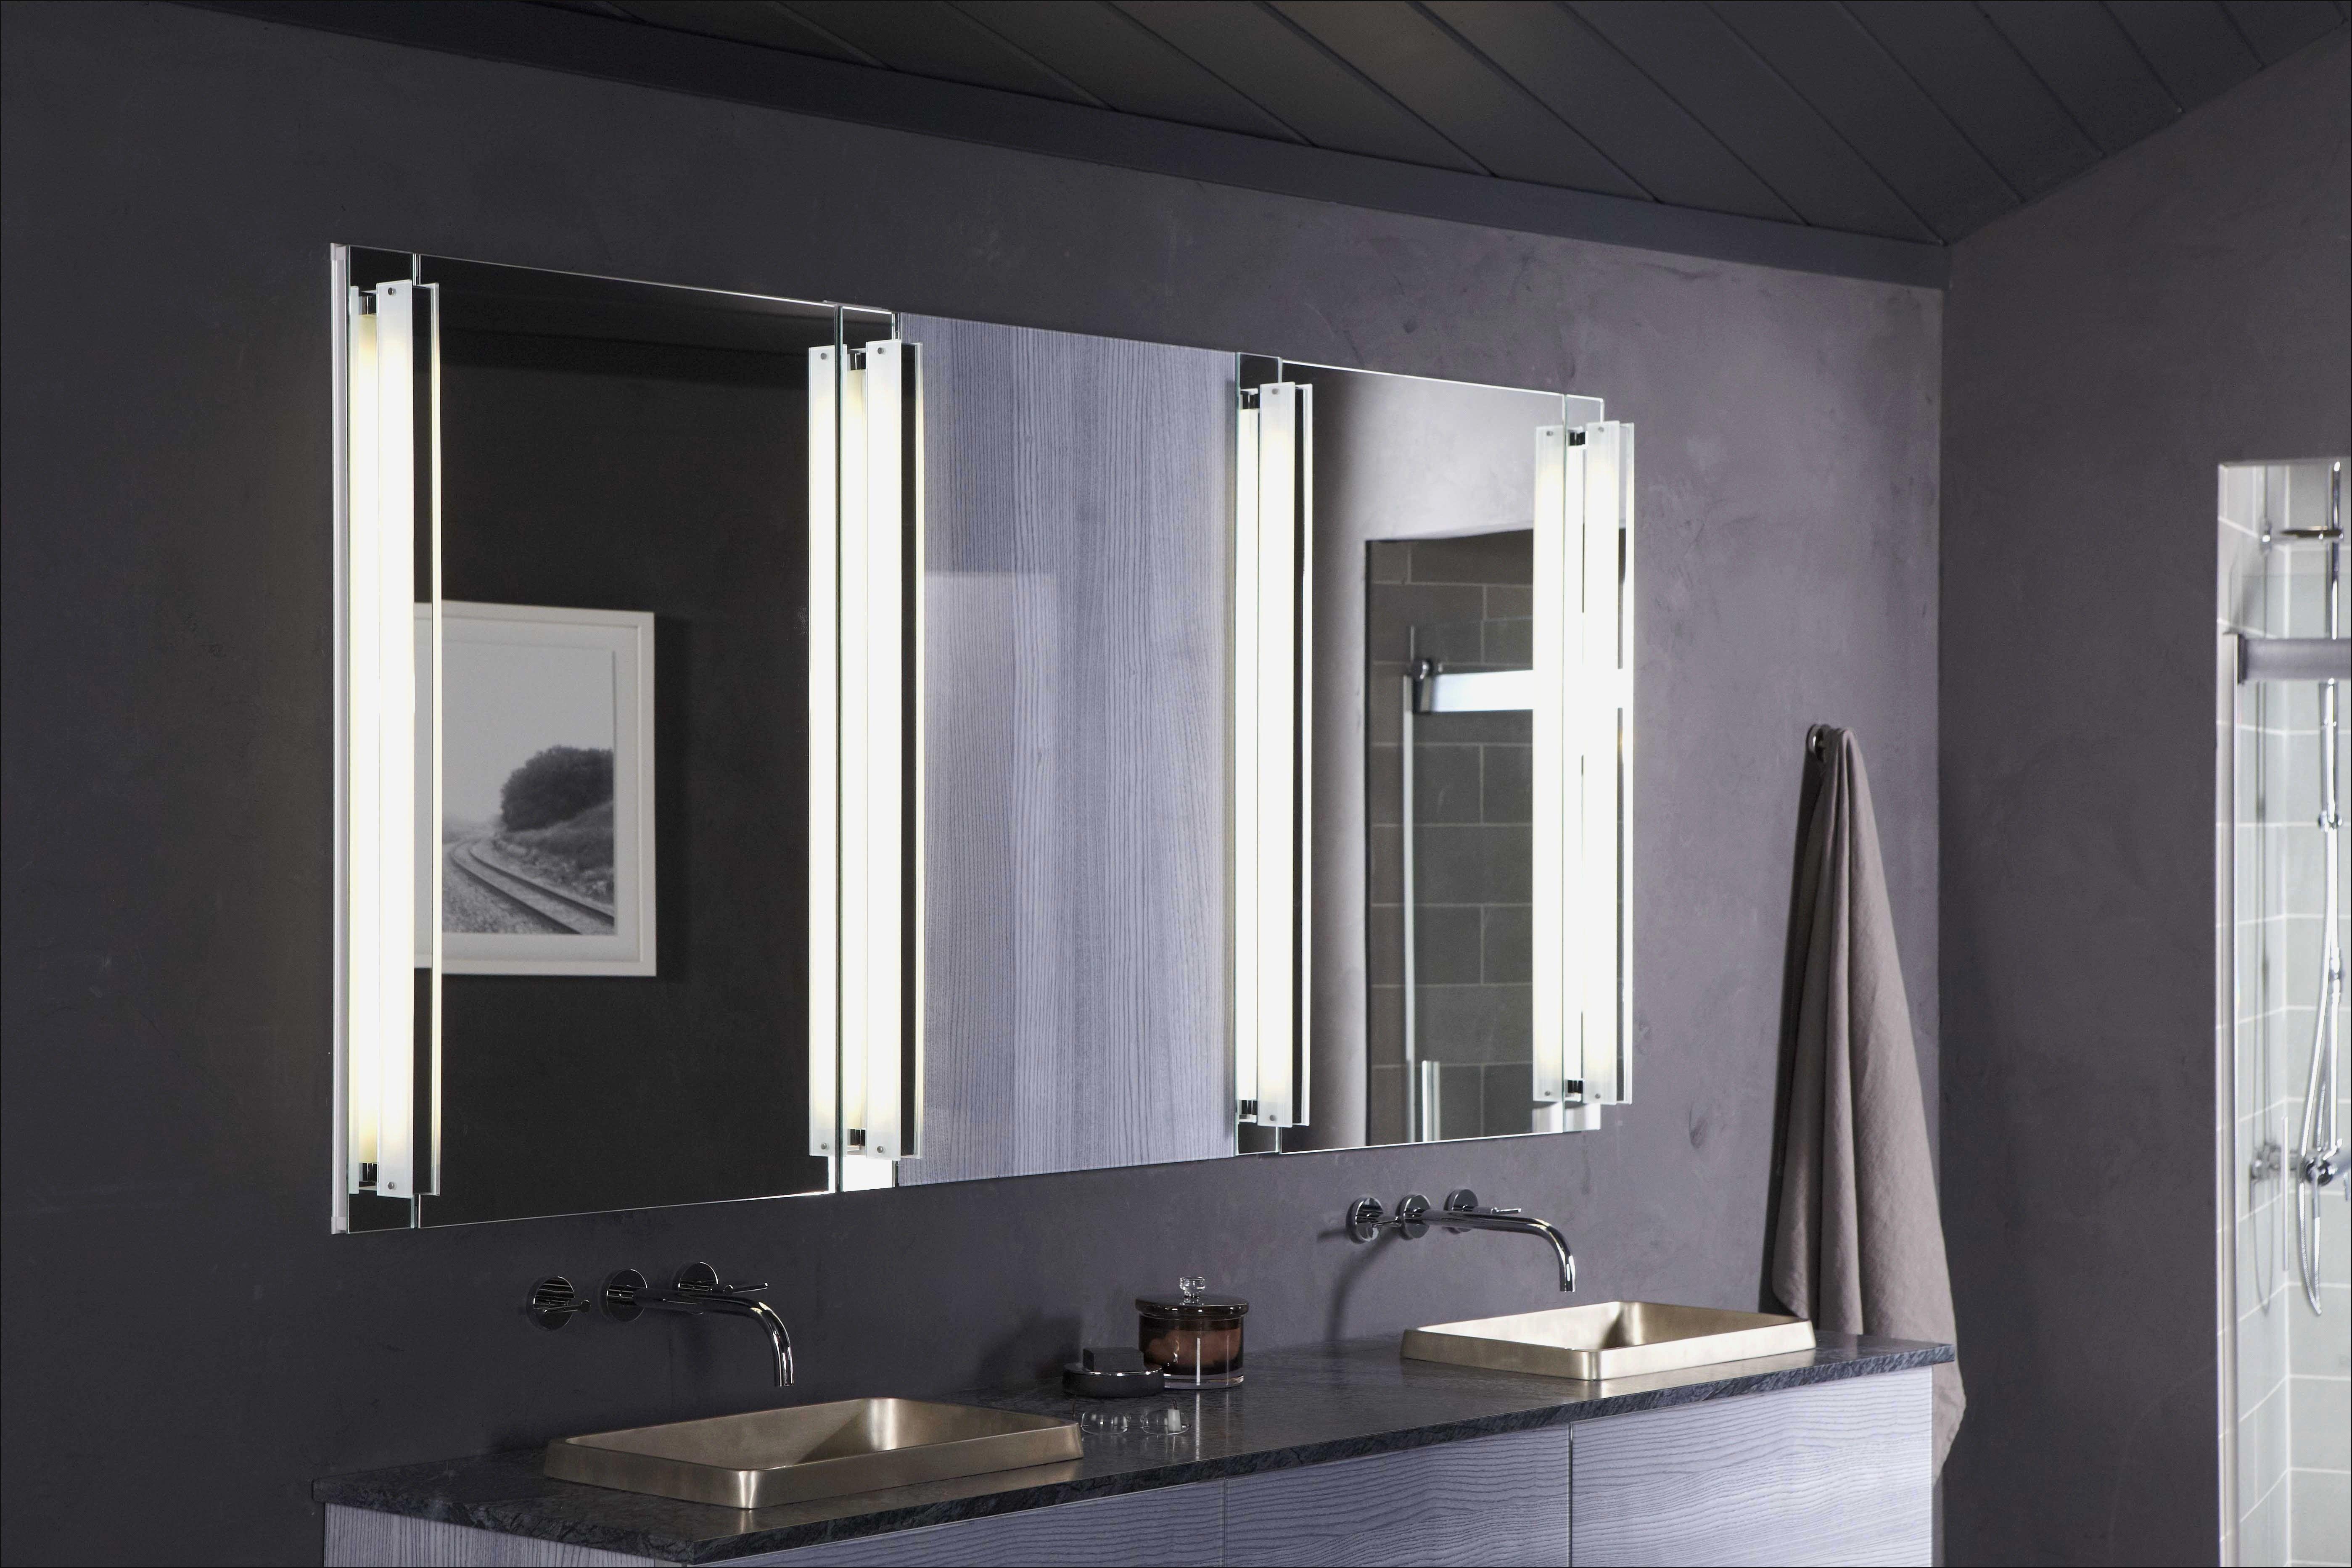 Bathroom Vanity With Medicine Cabinet Kohler Verdera Lighted Pertaining To Cabinets Ideas 5